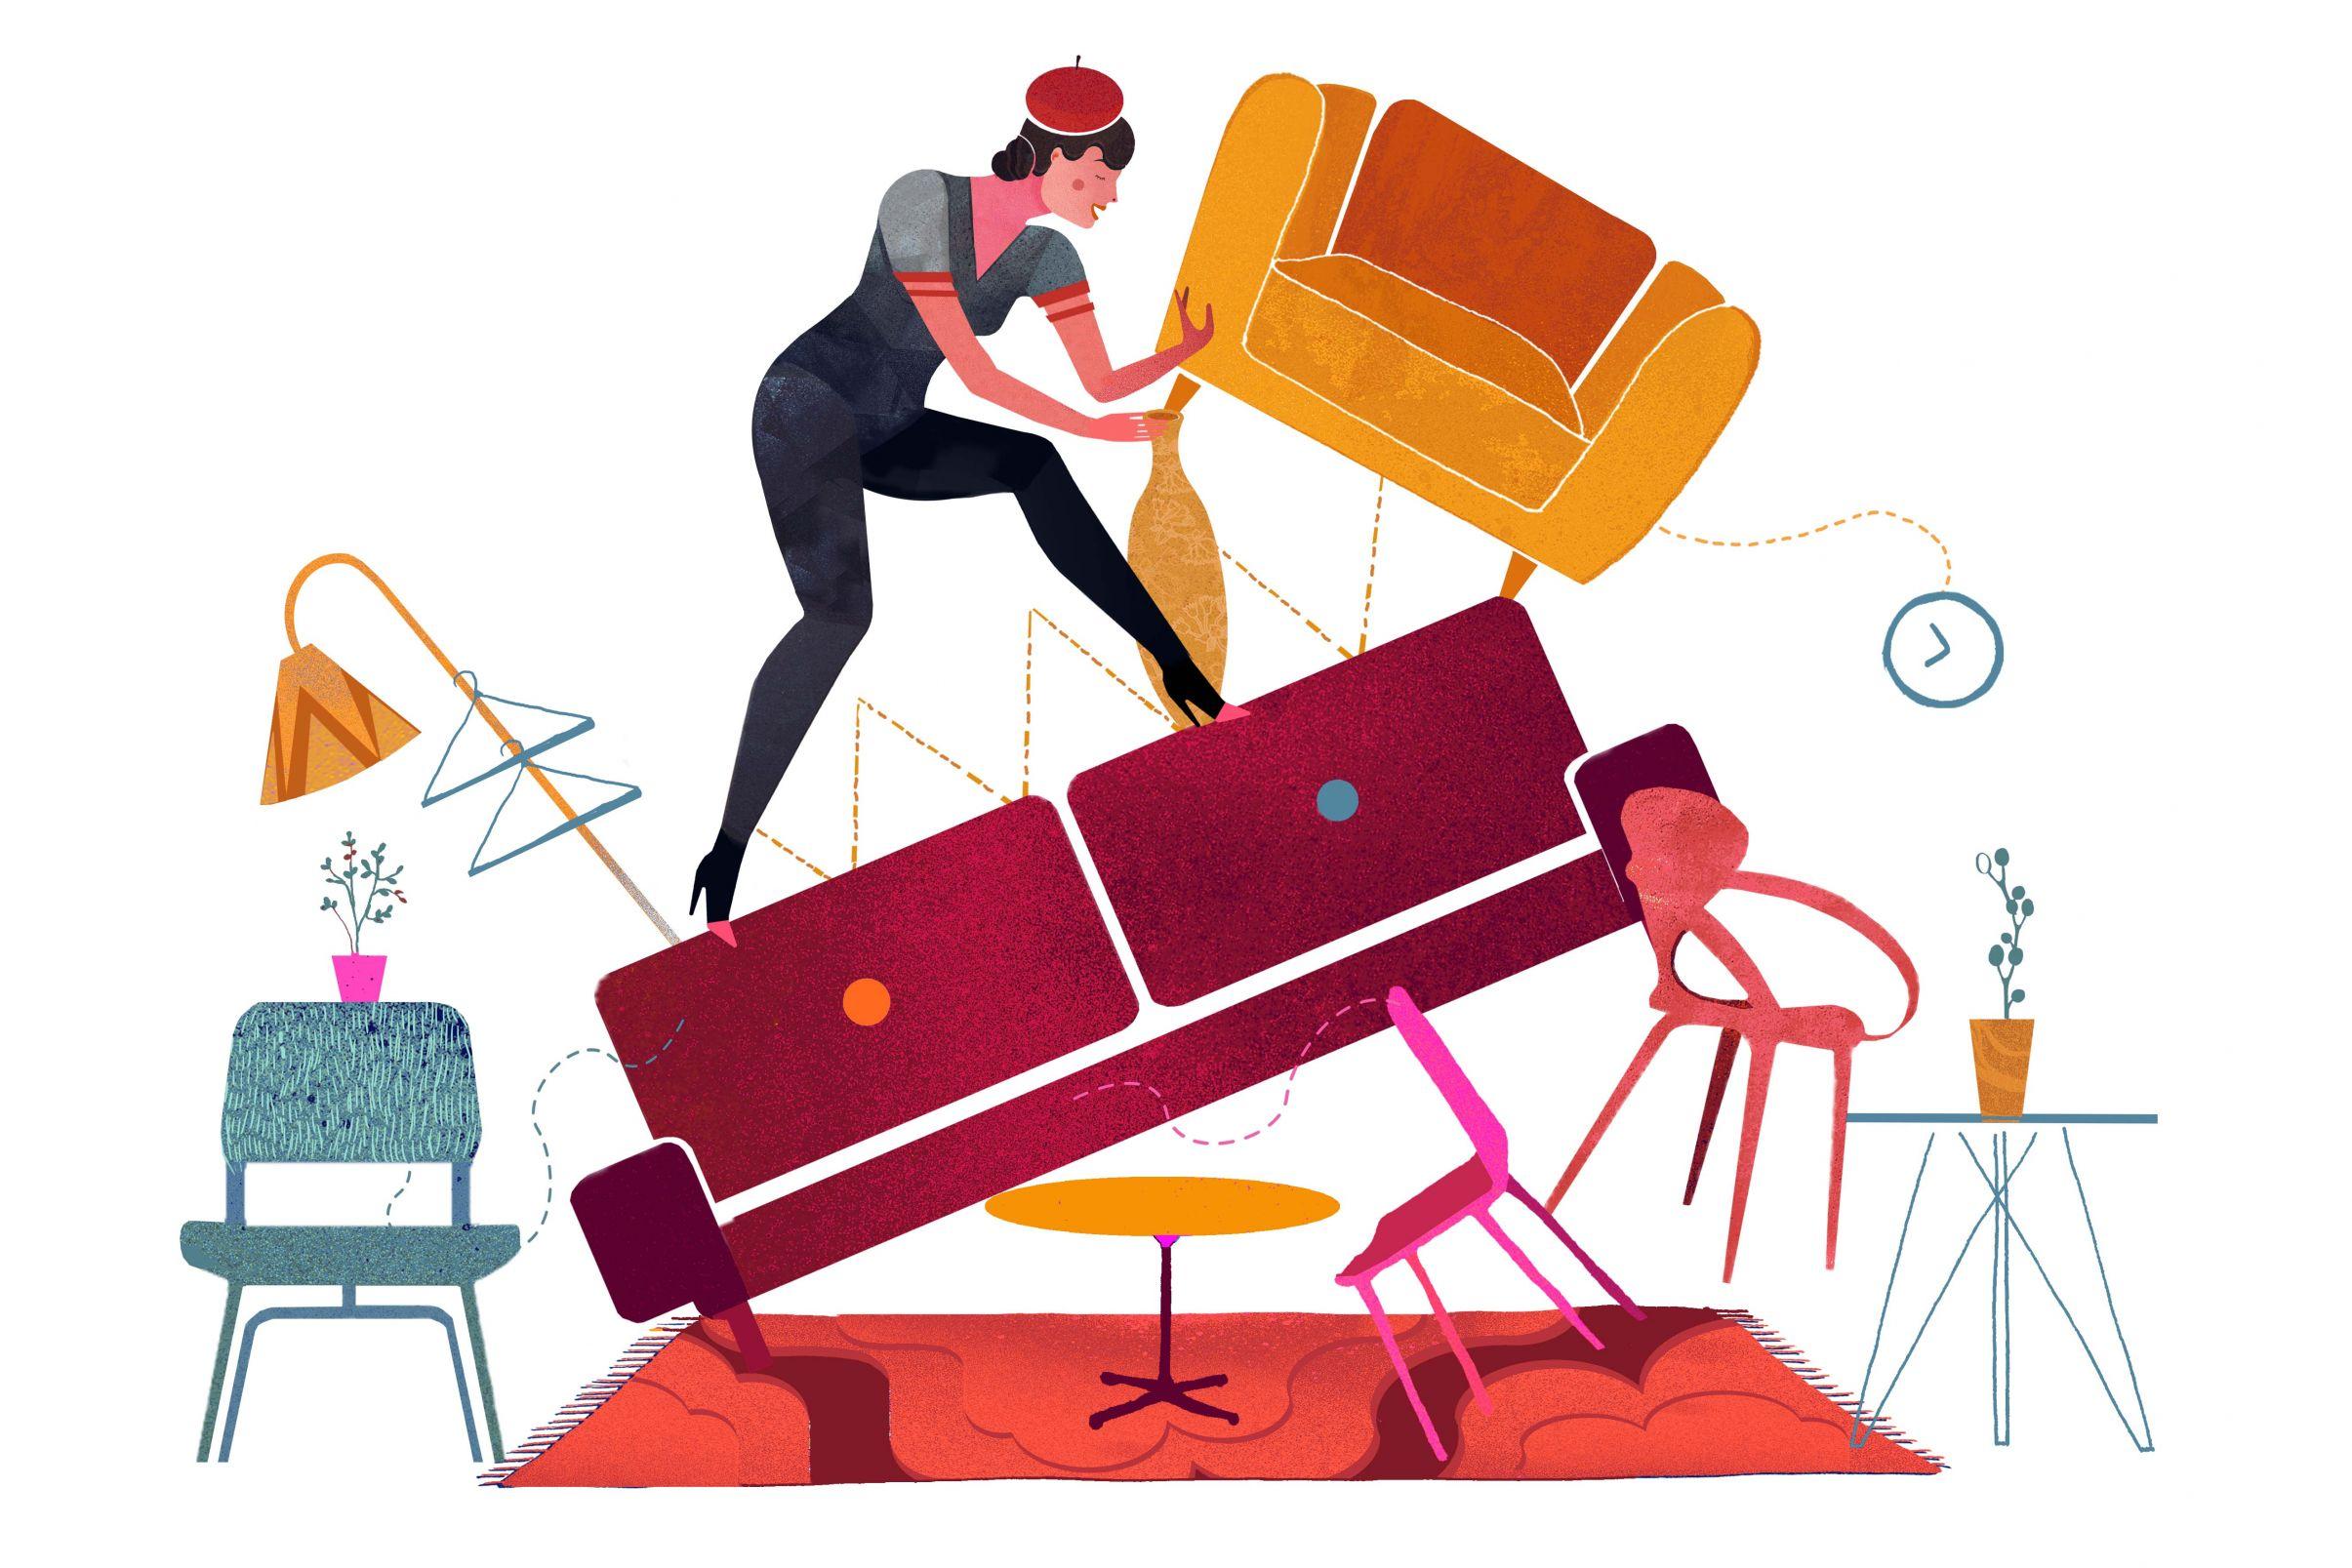 How to prepare for wallpapering move remove furniture